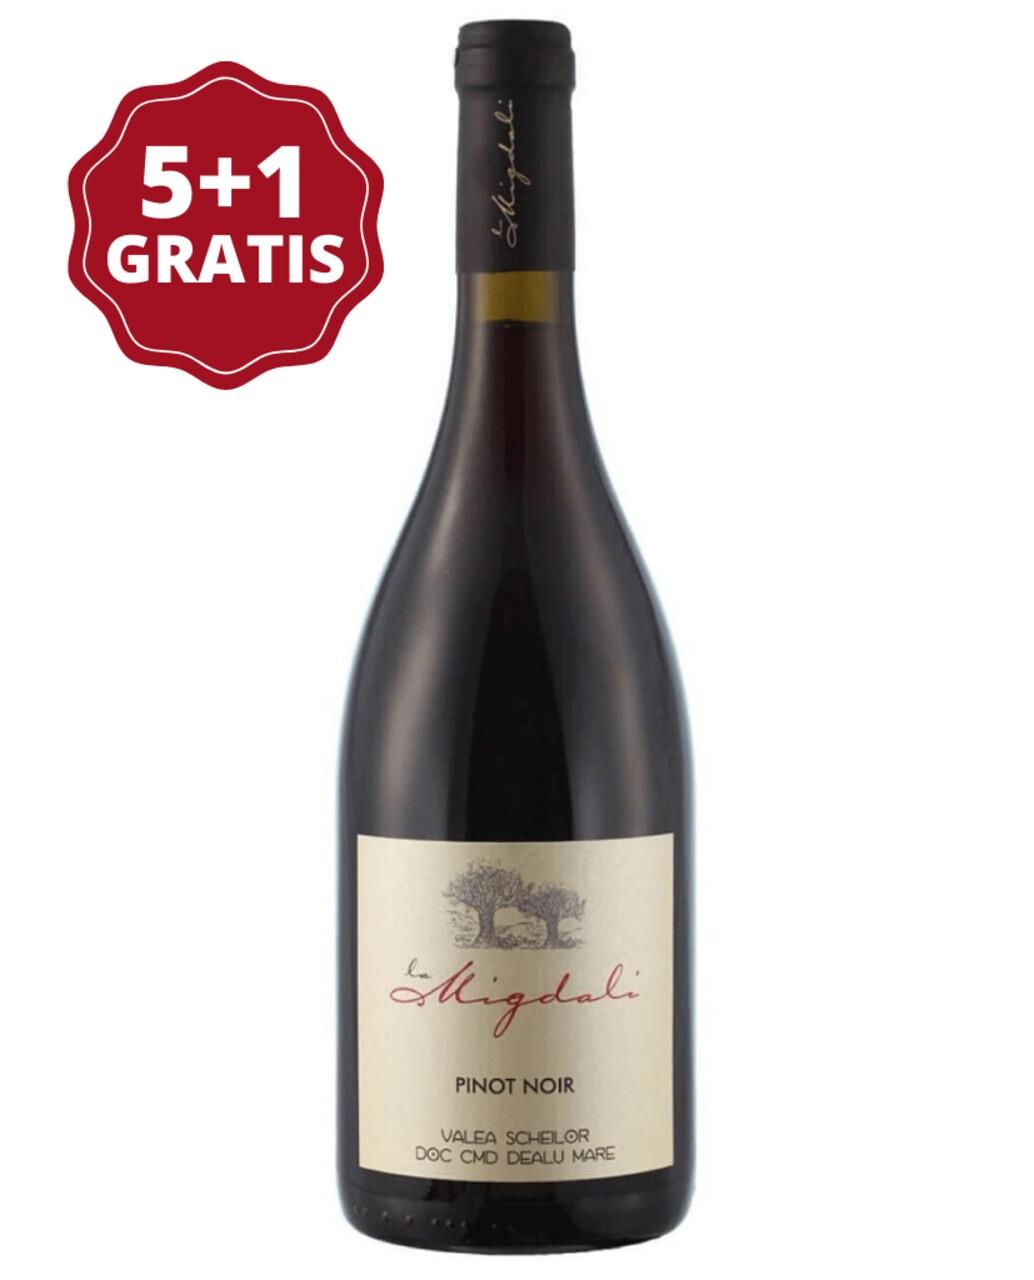 La Migdali Pinot Noir 5+1